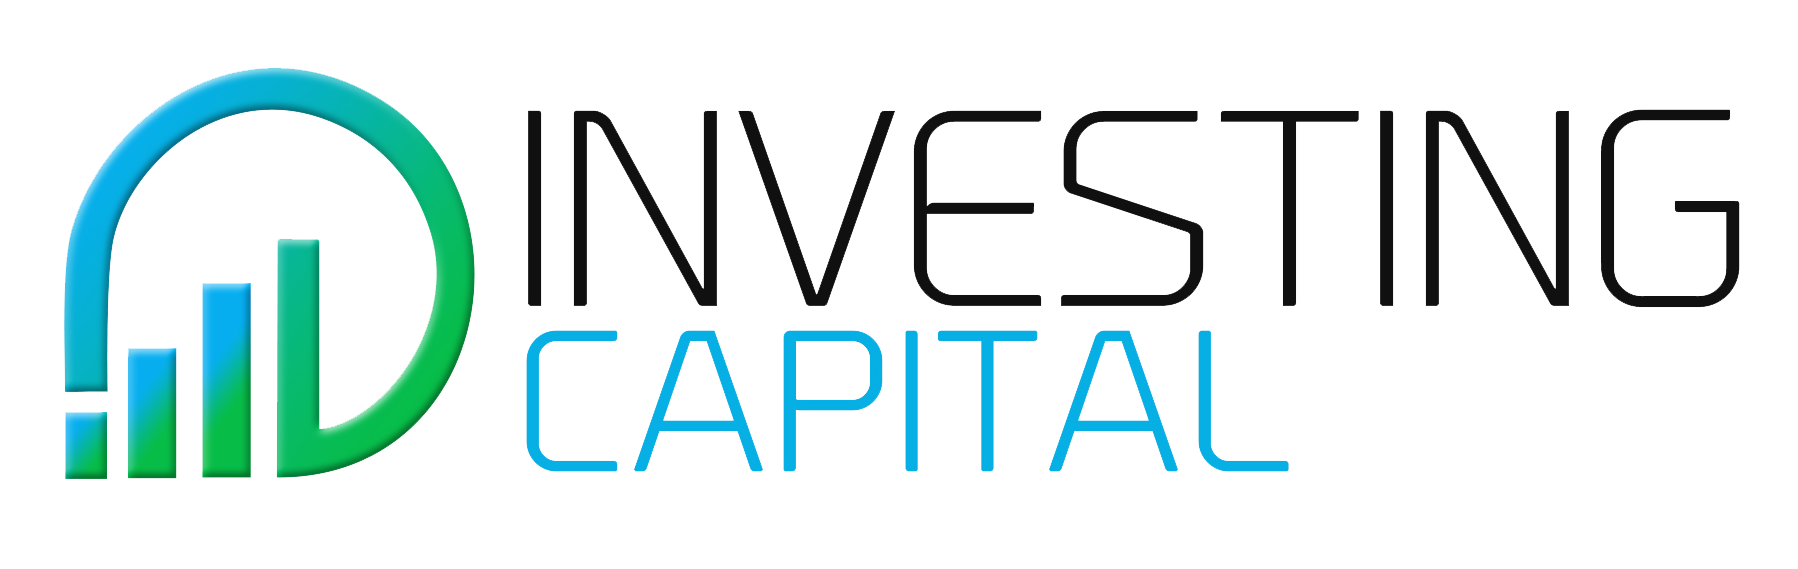 Digital Marketing StudioGenix Case Study - Investing Capital